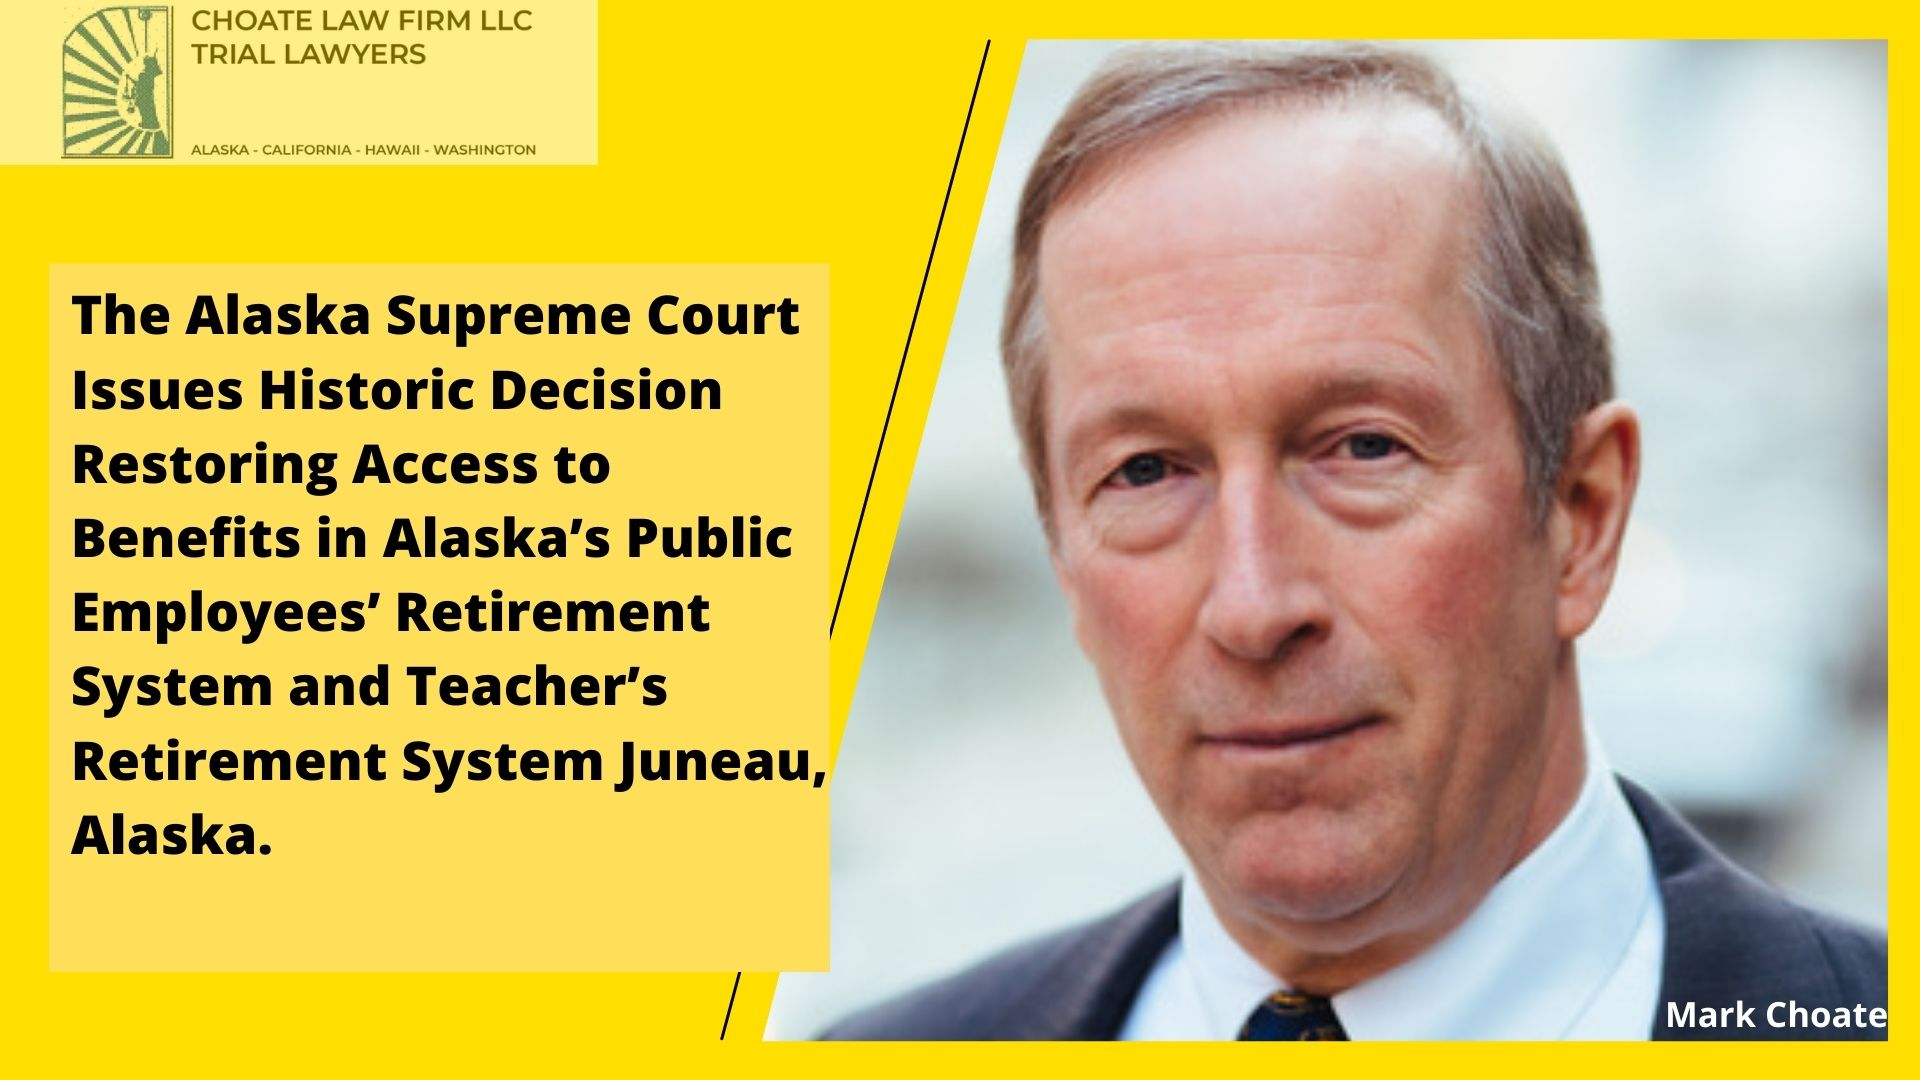 The Alaska Supreme Court Issues Historic Decision Restoring Access to Benefits in Alaskas Public Employees Retirement System and Teachers Retirement System Juneau Alaska.